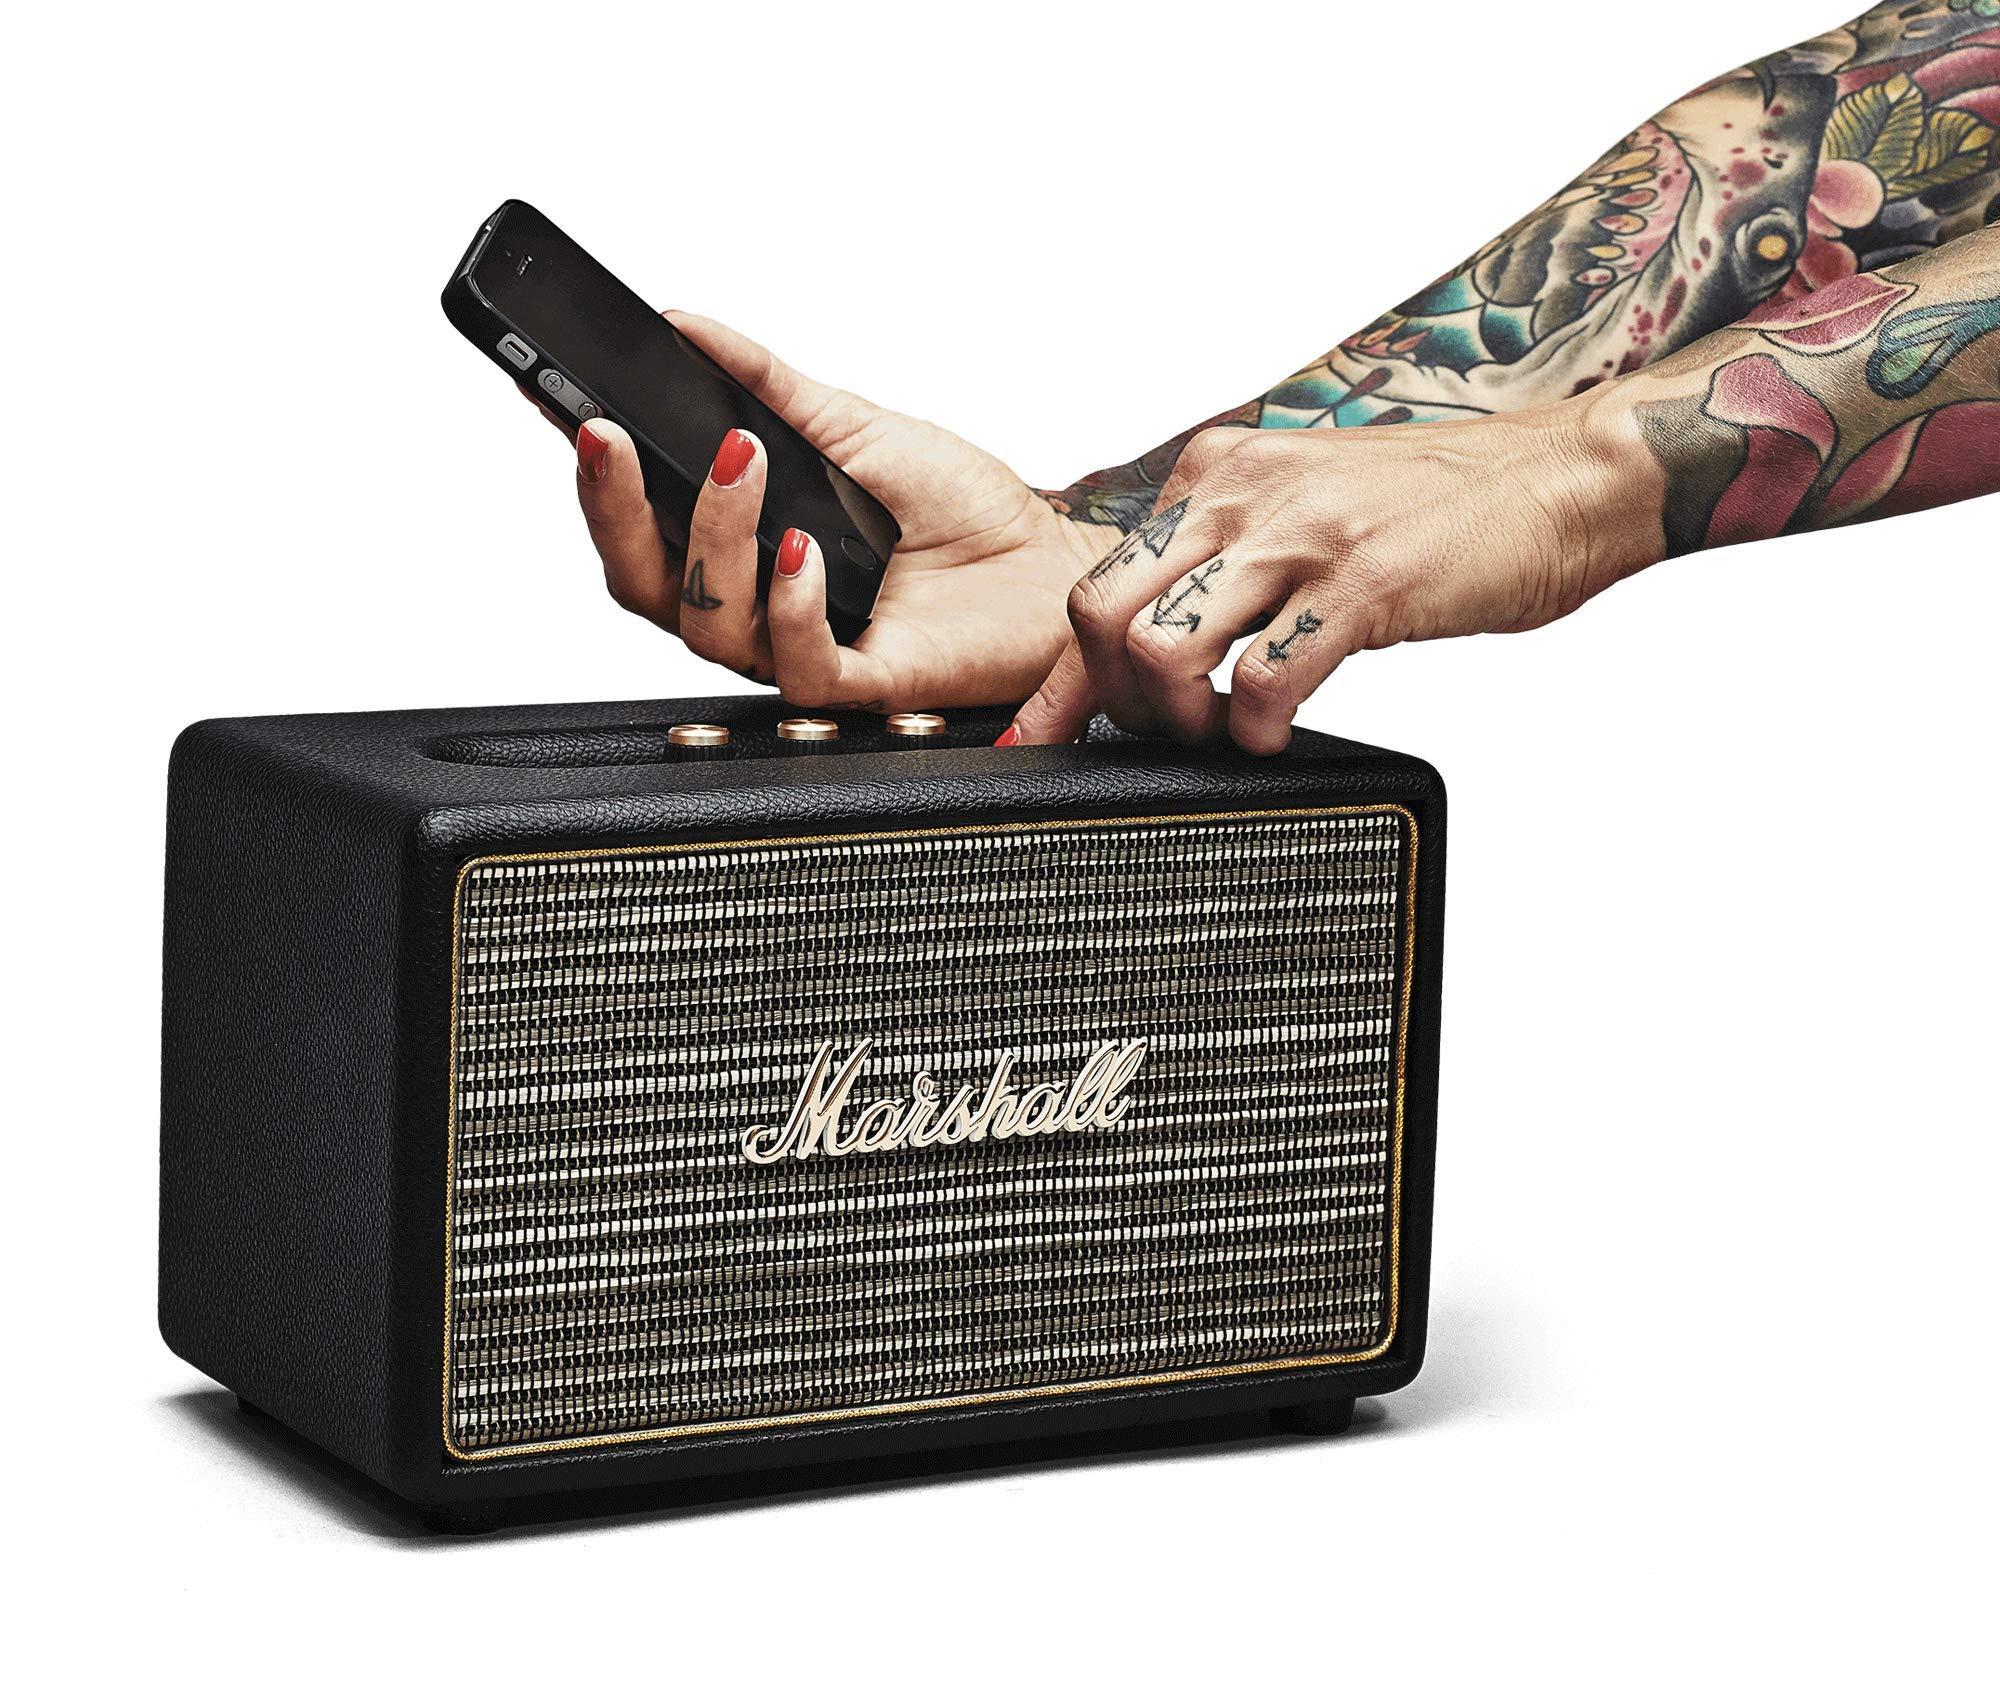 Marshall 04091802 Acton Wireless Bluetooth Speaker Black by Marshall (Image #4)